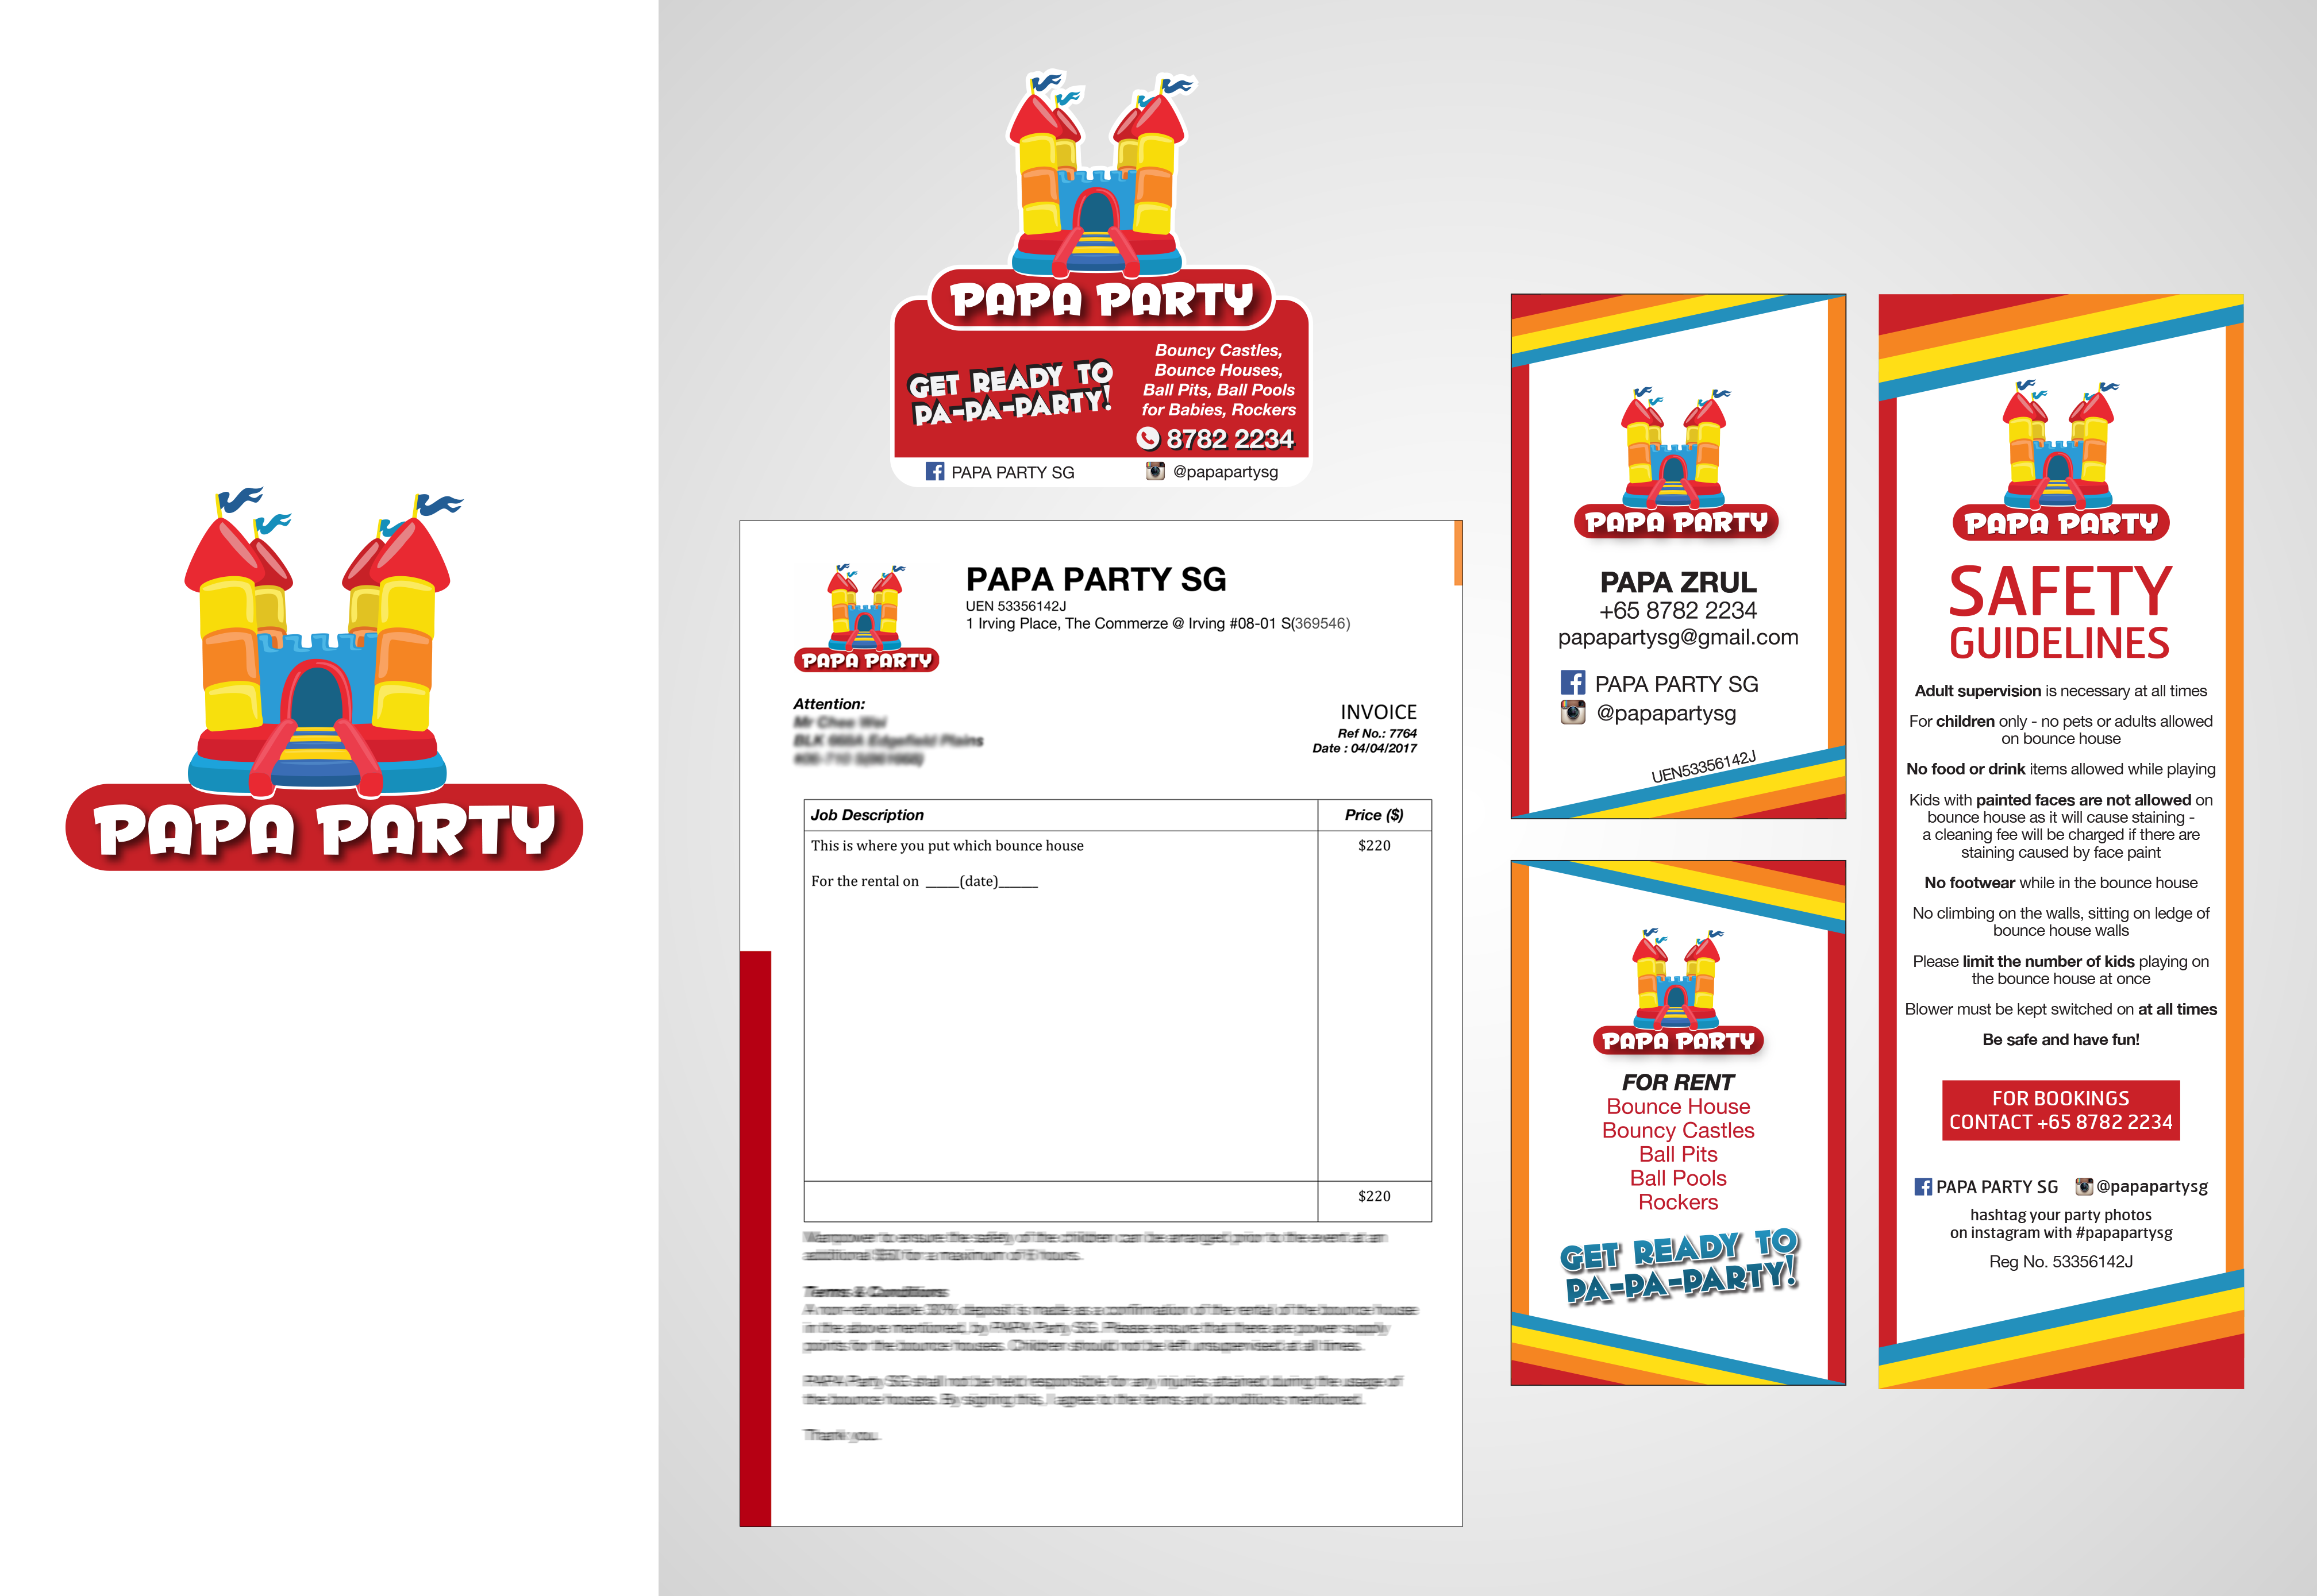 Design & Analytics dna_papaparty4 Papa Party (SG)